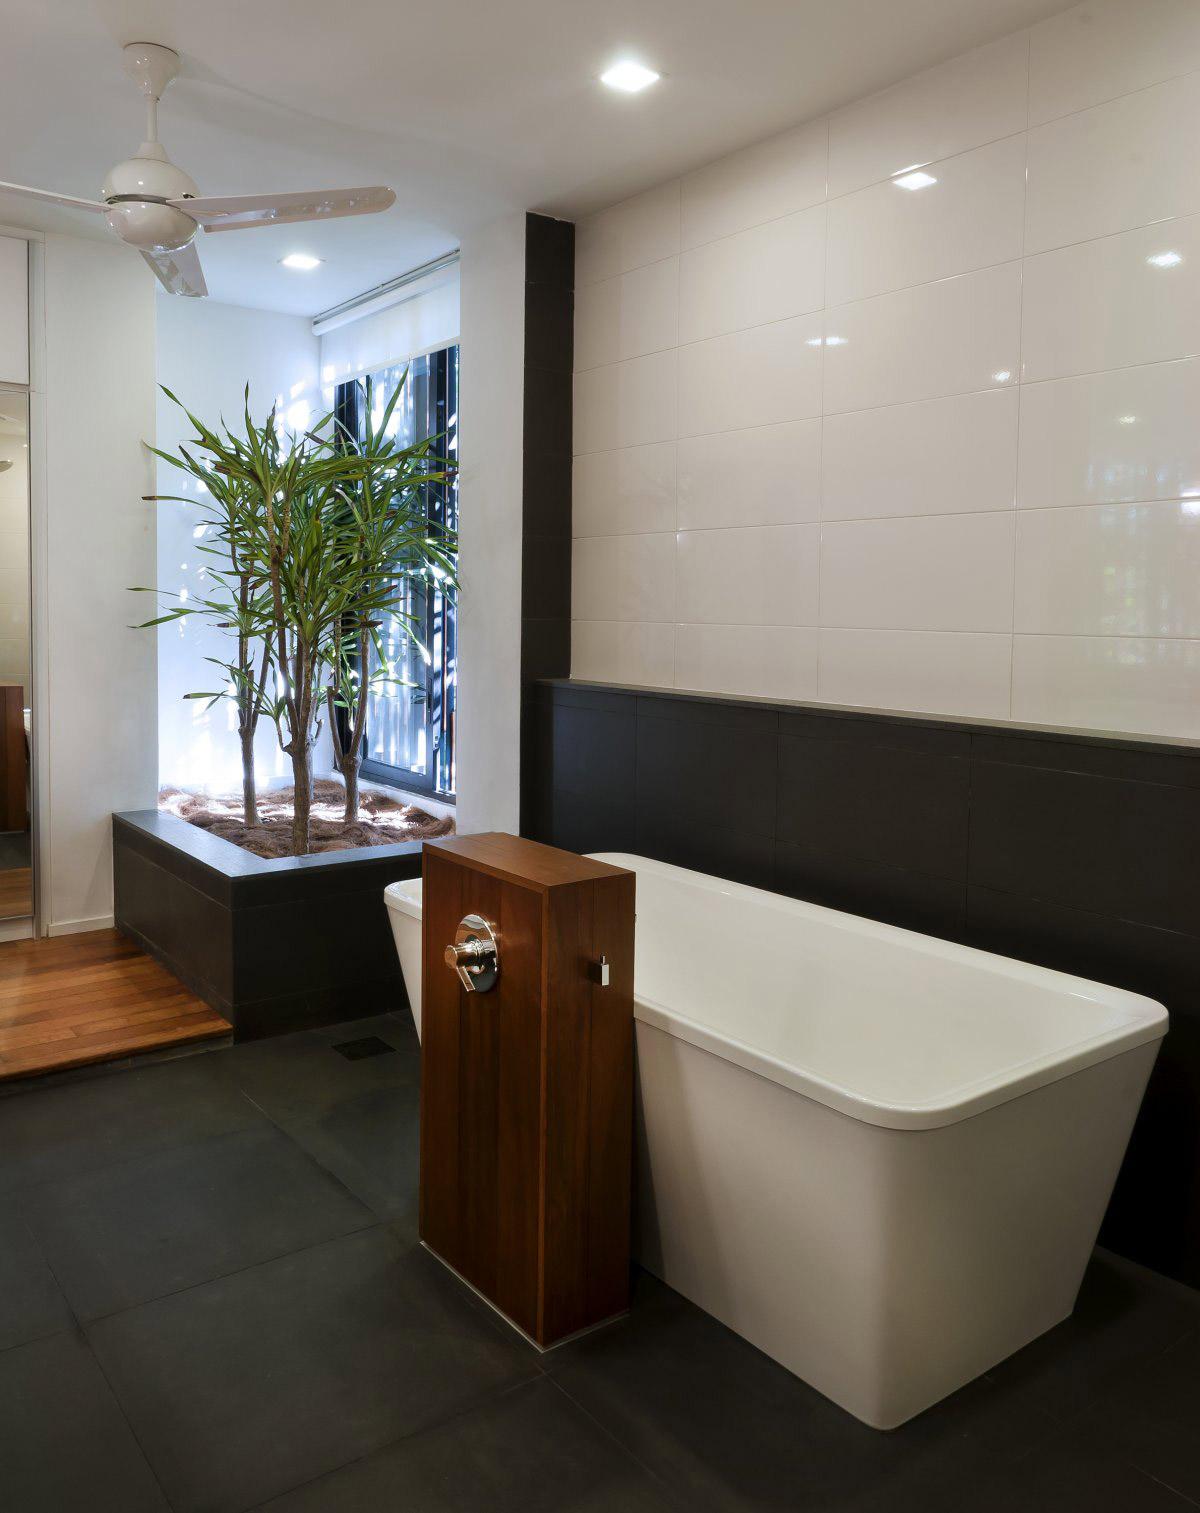 Dark Bathroom Floor Tiles With Innovative Type | eyagci.com